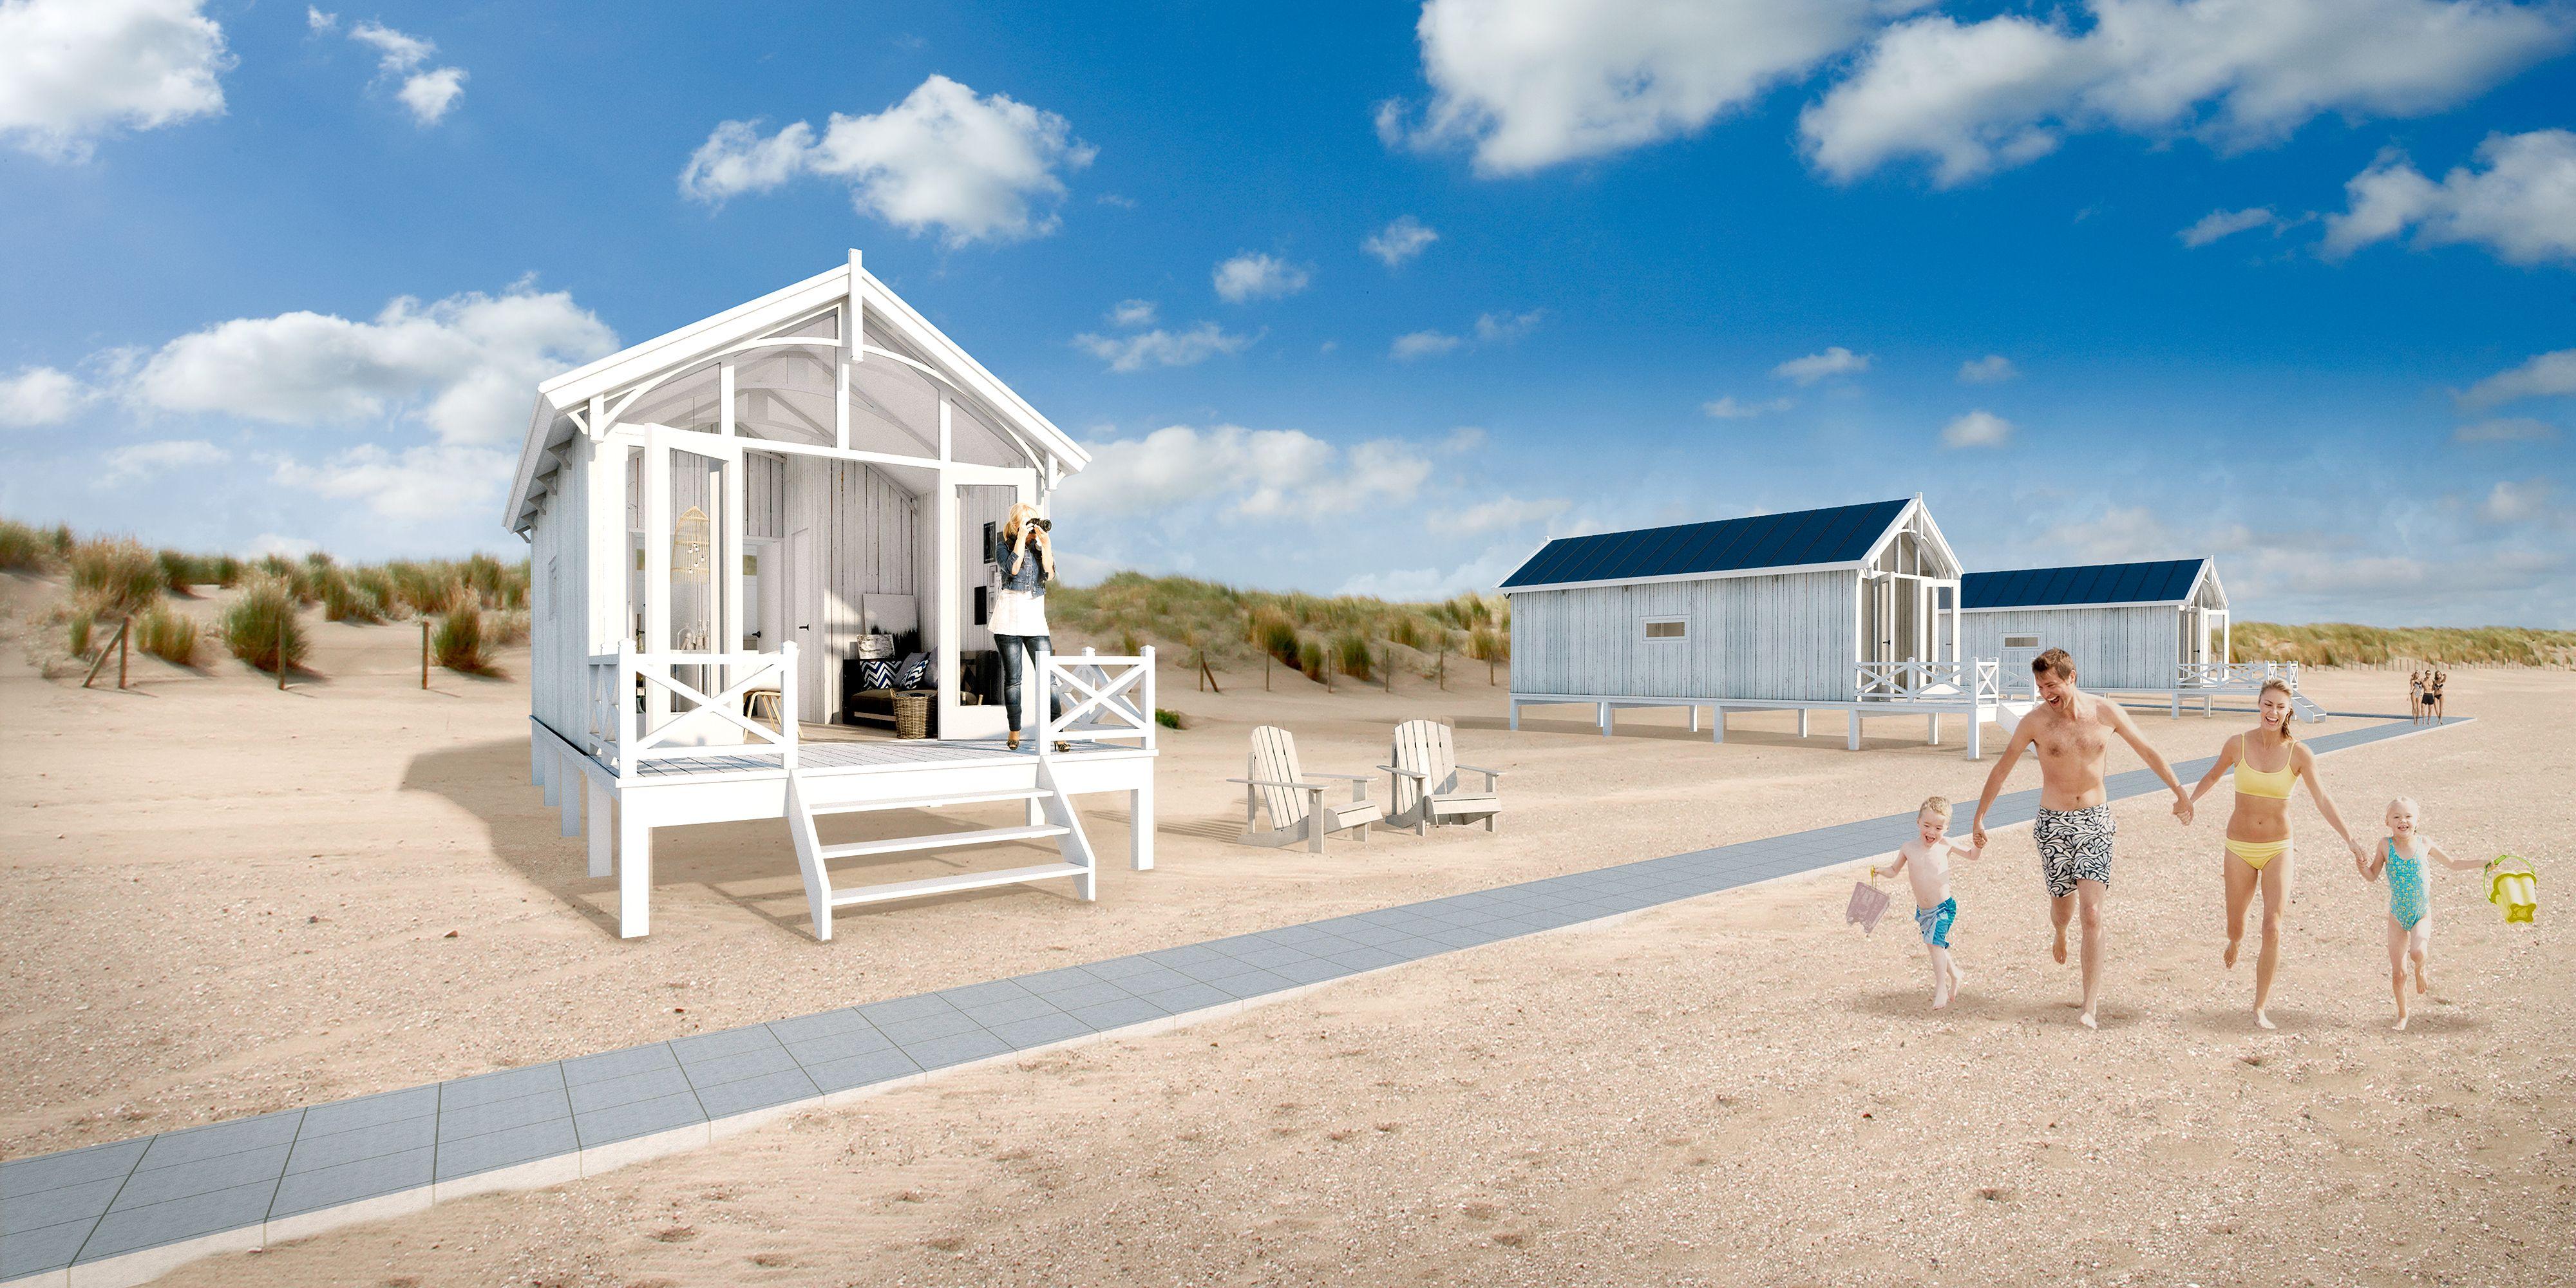 slapen op het strand vanaf april 2016 kunt u strandhuisjes huren in den haag strandh user. Black Bedroom Furniture Sets. Home Design Ideas